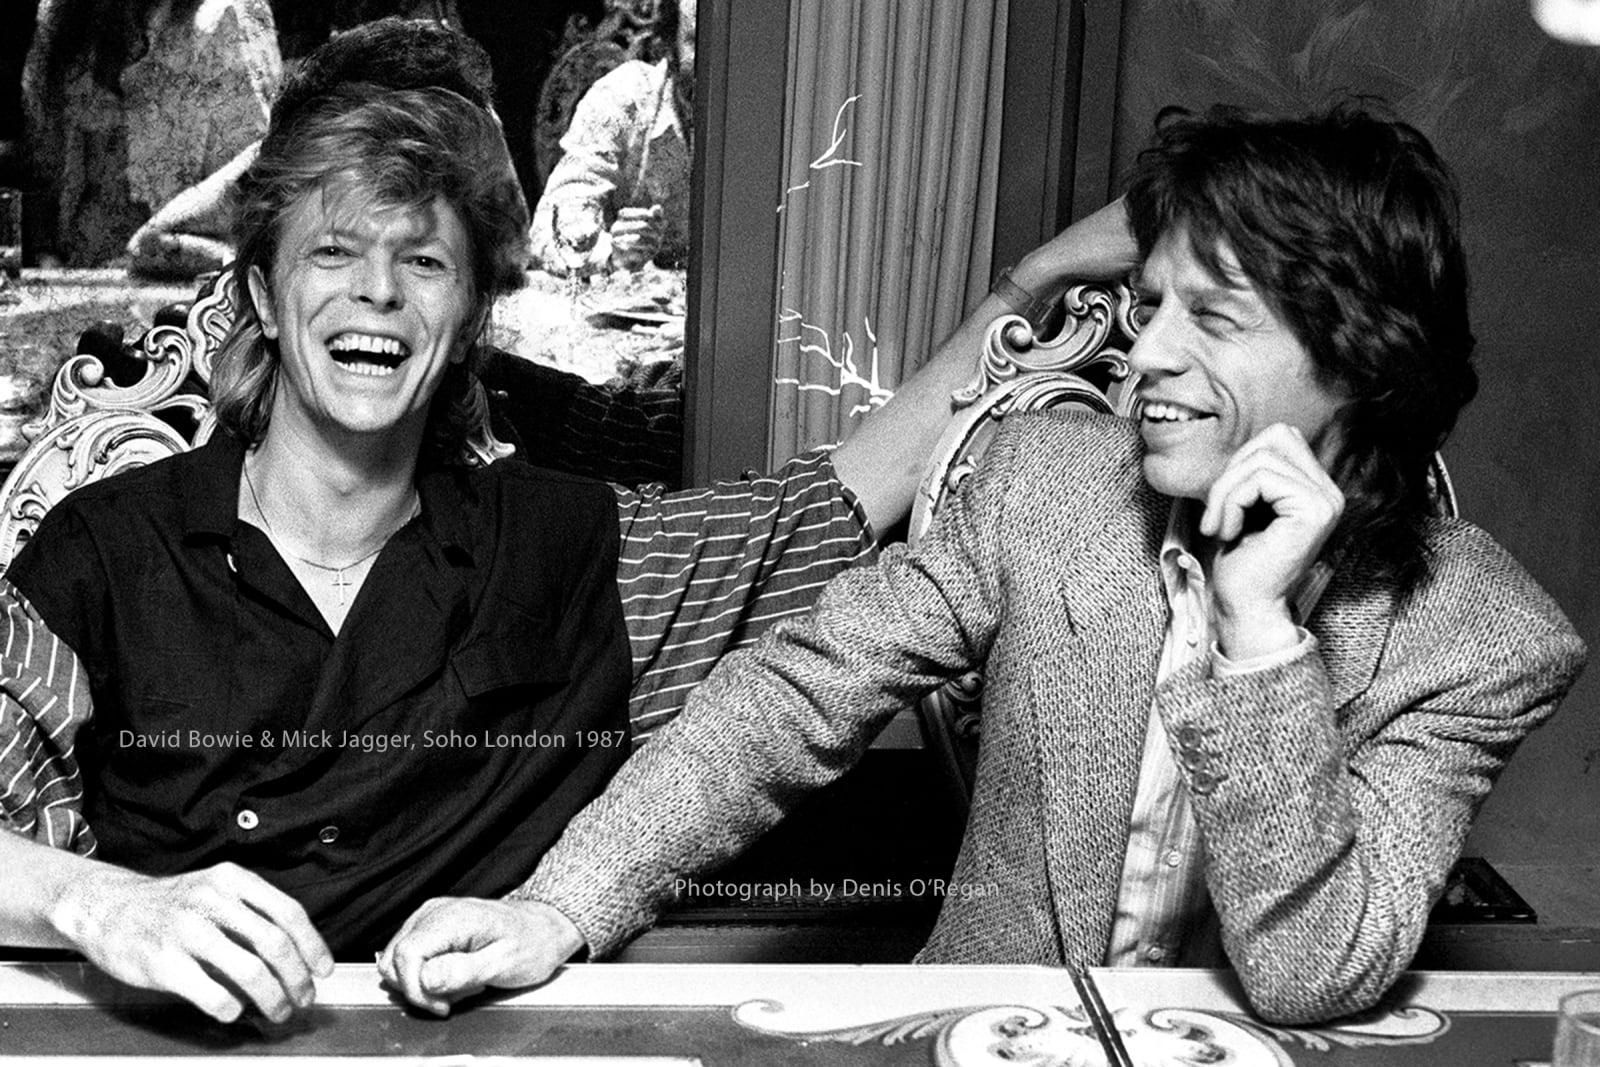 DAVID BOWIE, David Bowie & Mick Jagger London, 1987